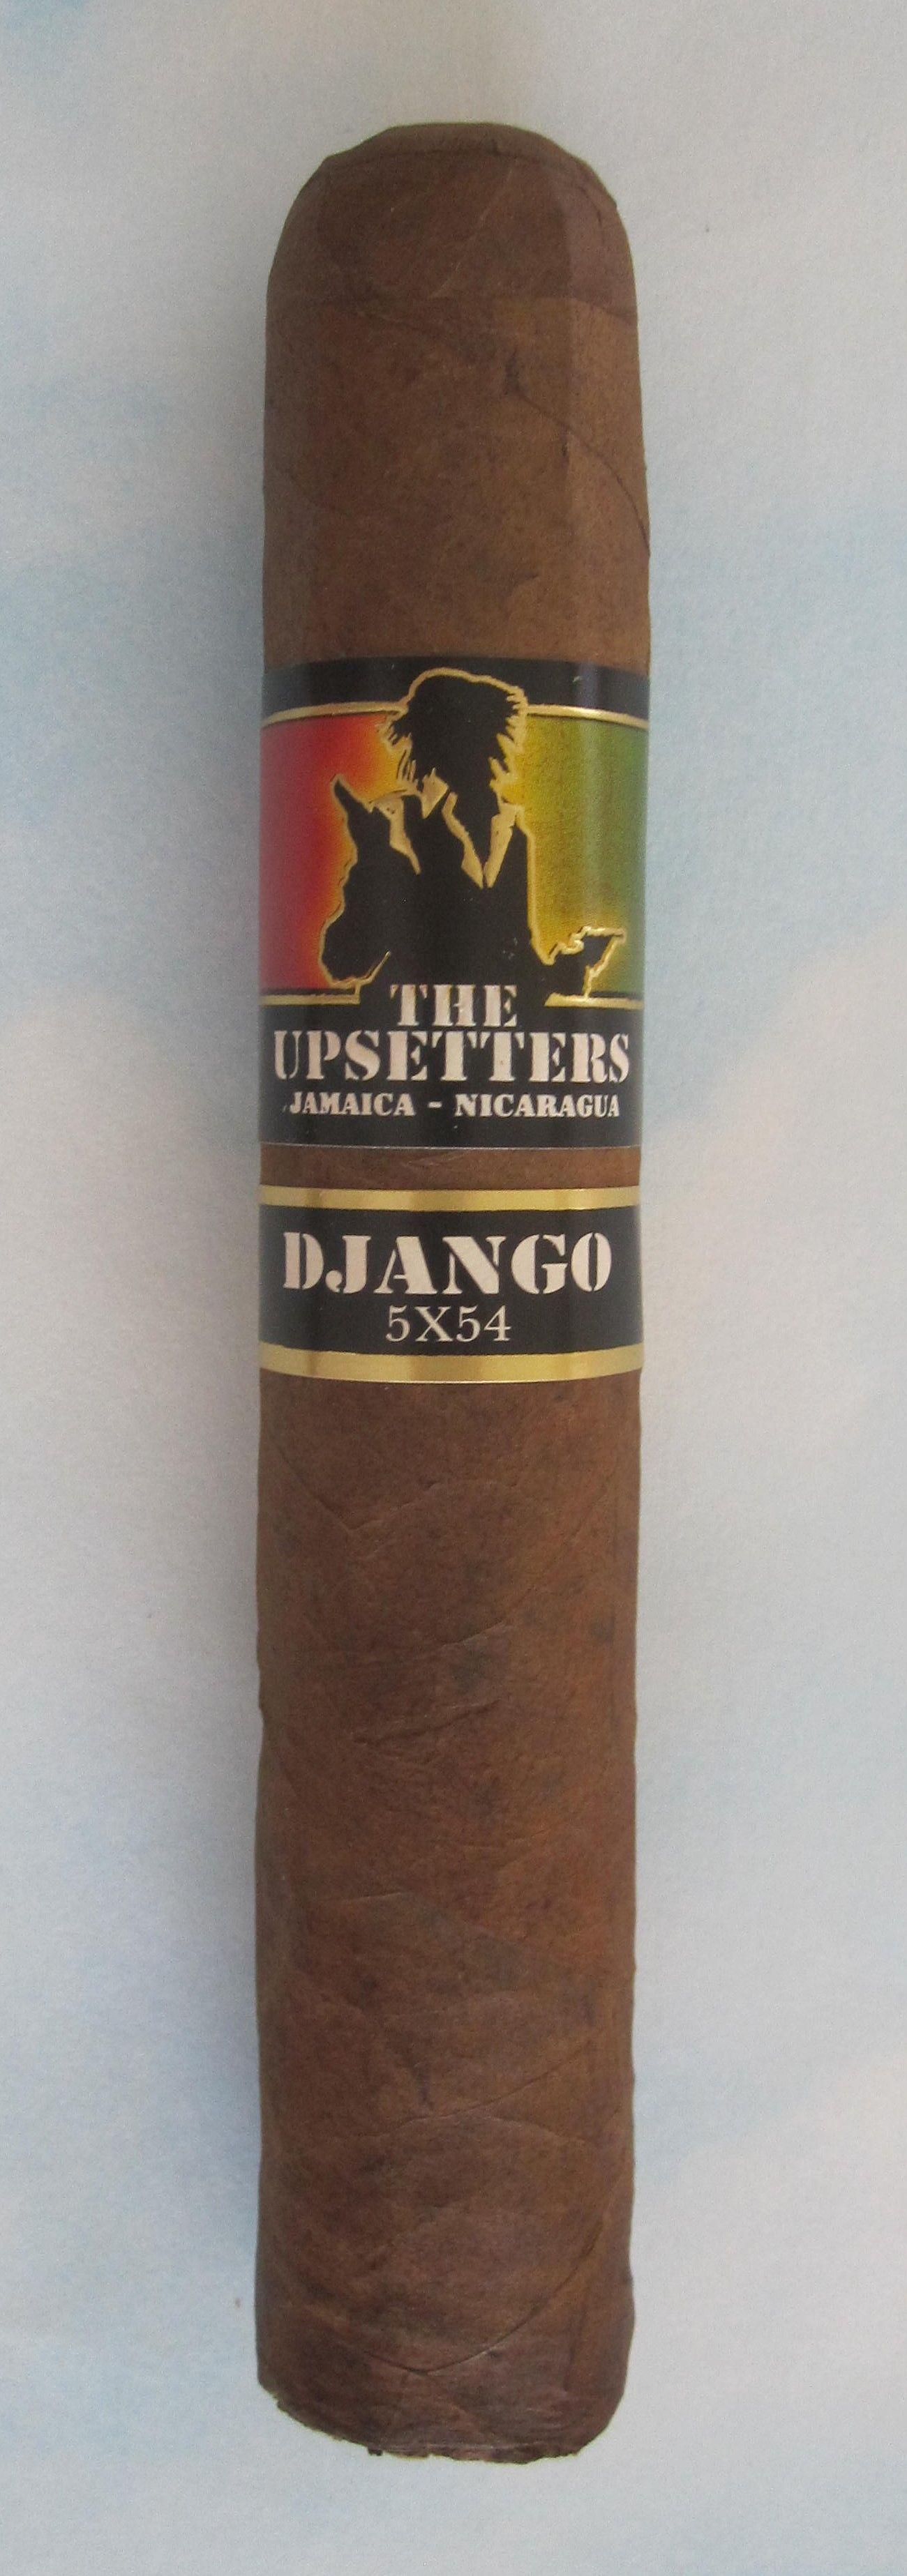 The Upsetters Django Cigar